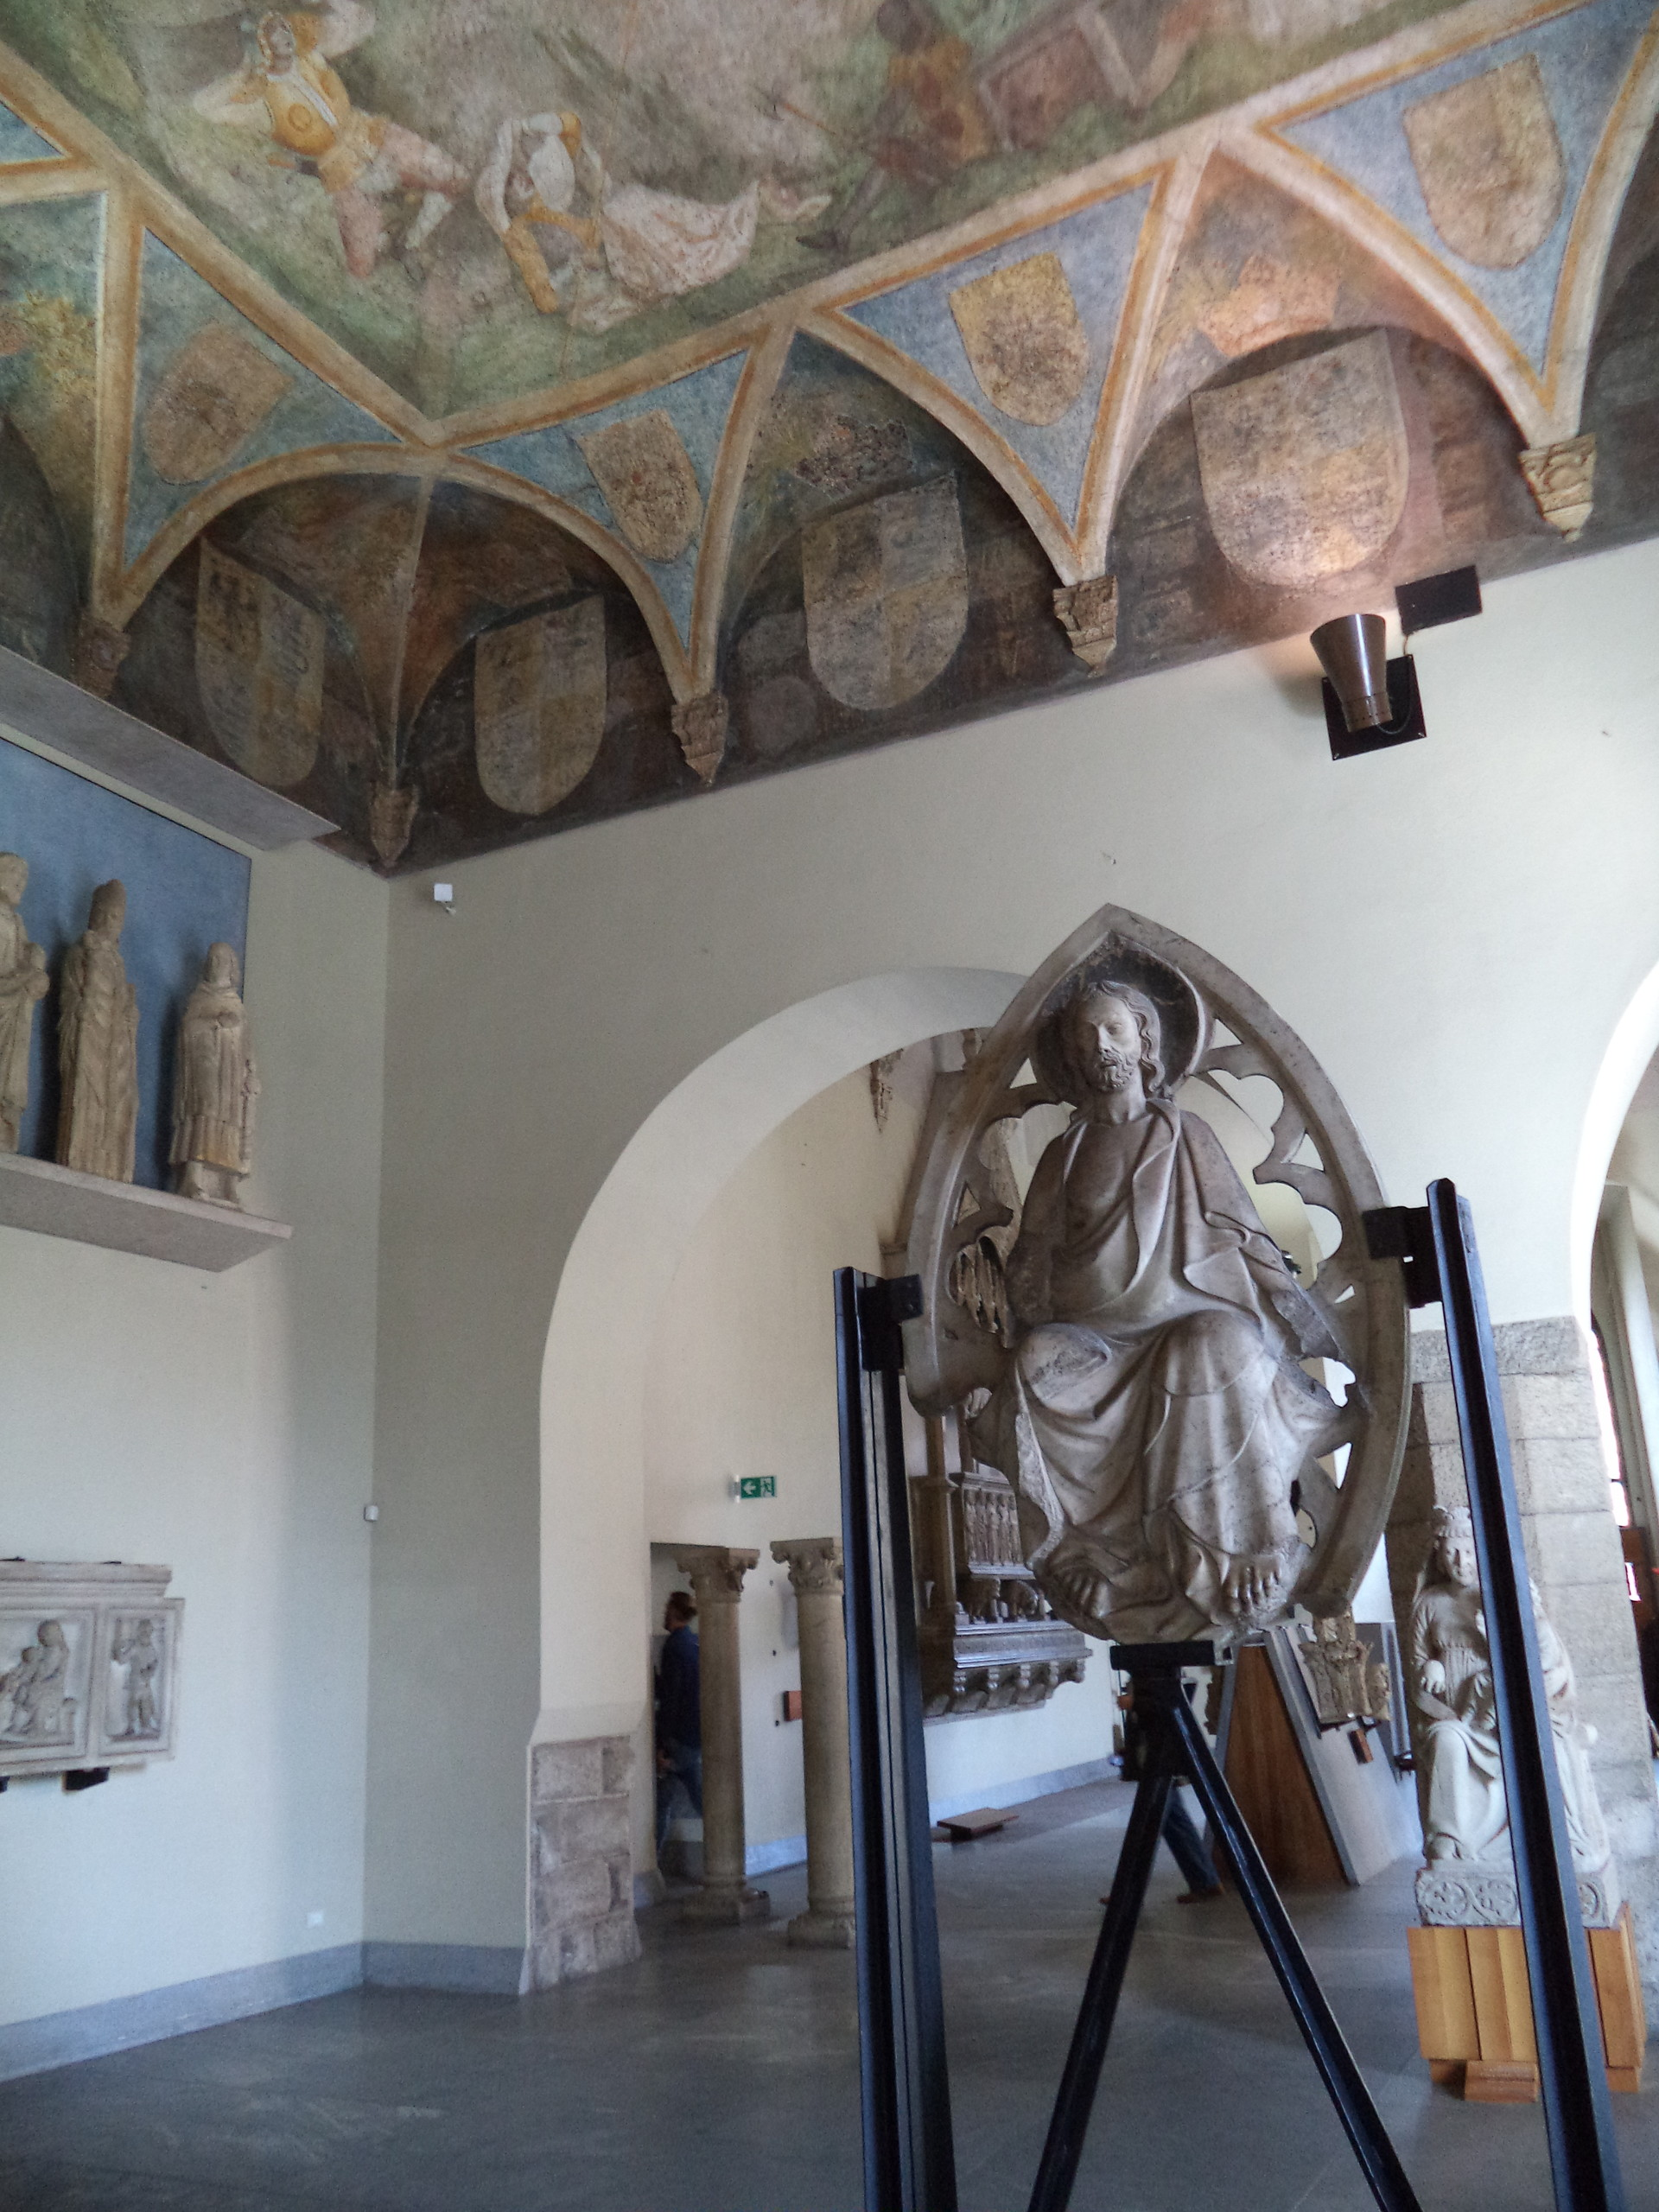 12 pequenas jóias a visitar dentro do Castelo!